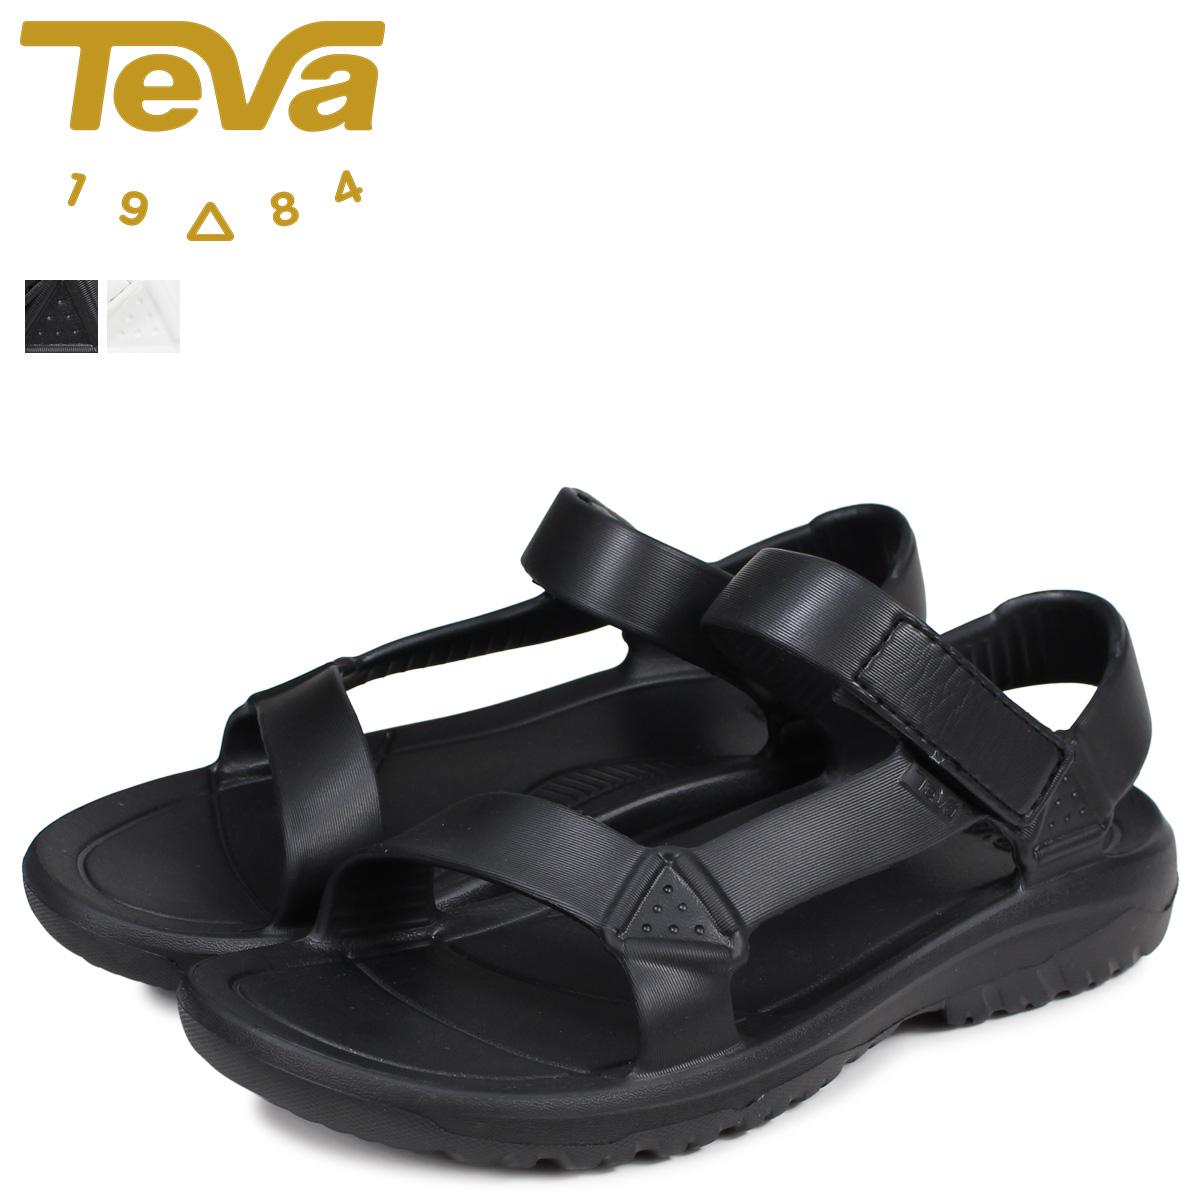 Teva テバ サンダル ハリケーン メンズ HURRICANE DRIFT ブラック ホワイト 黒 白 1100270